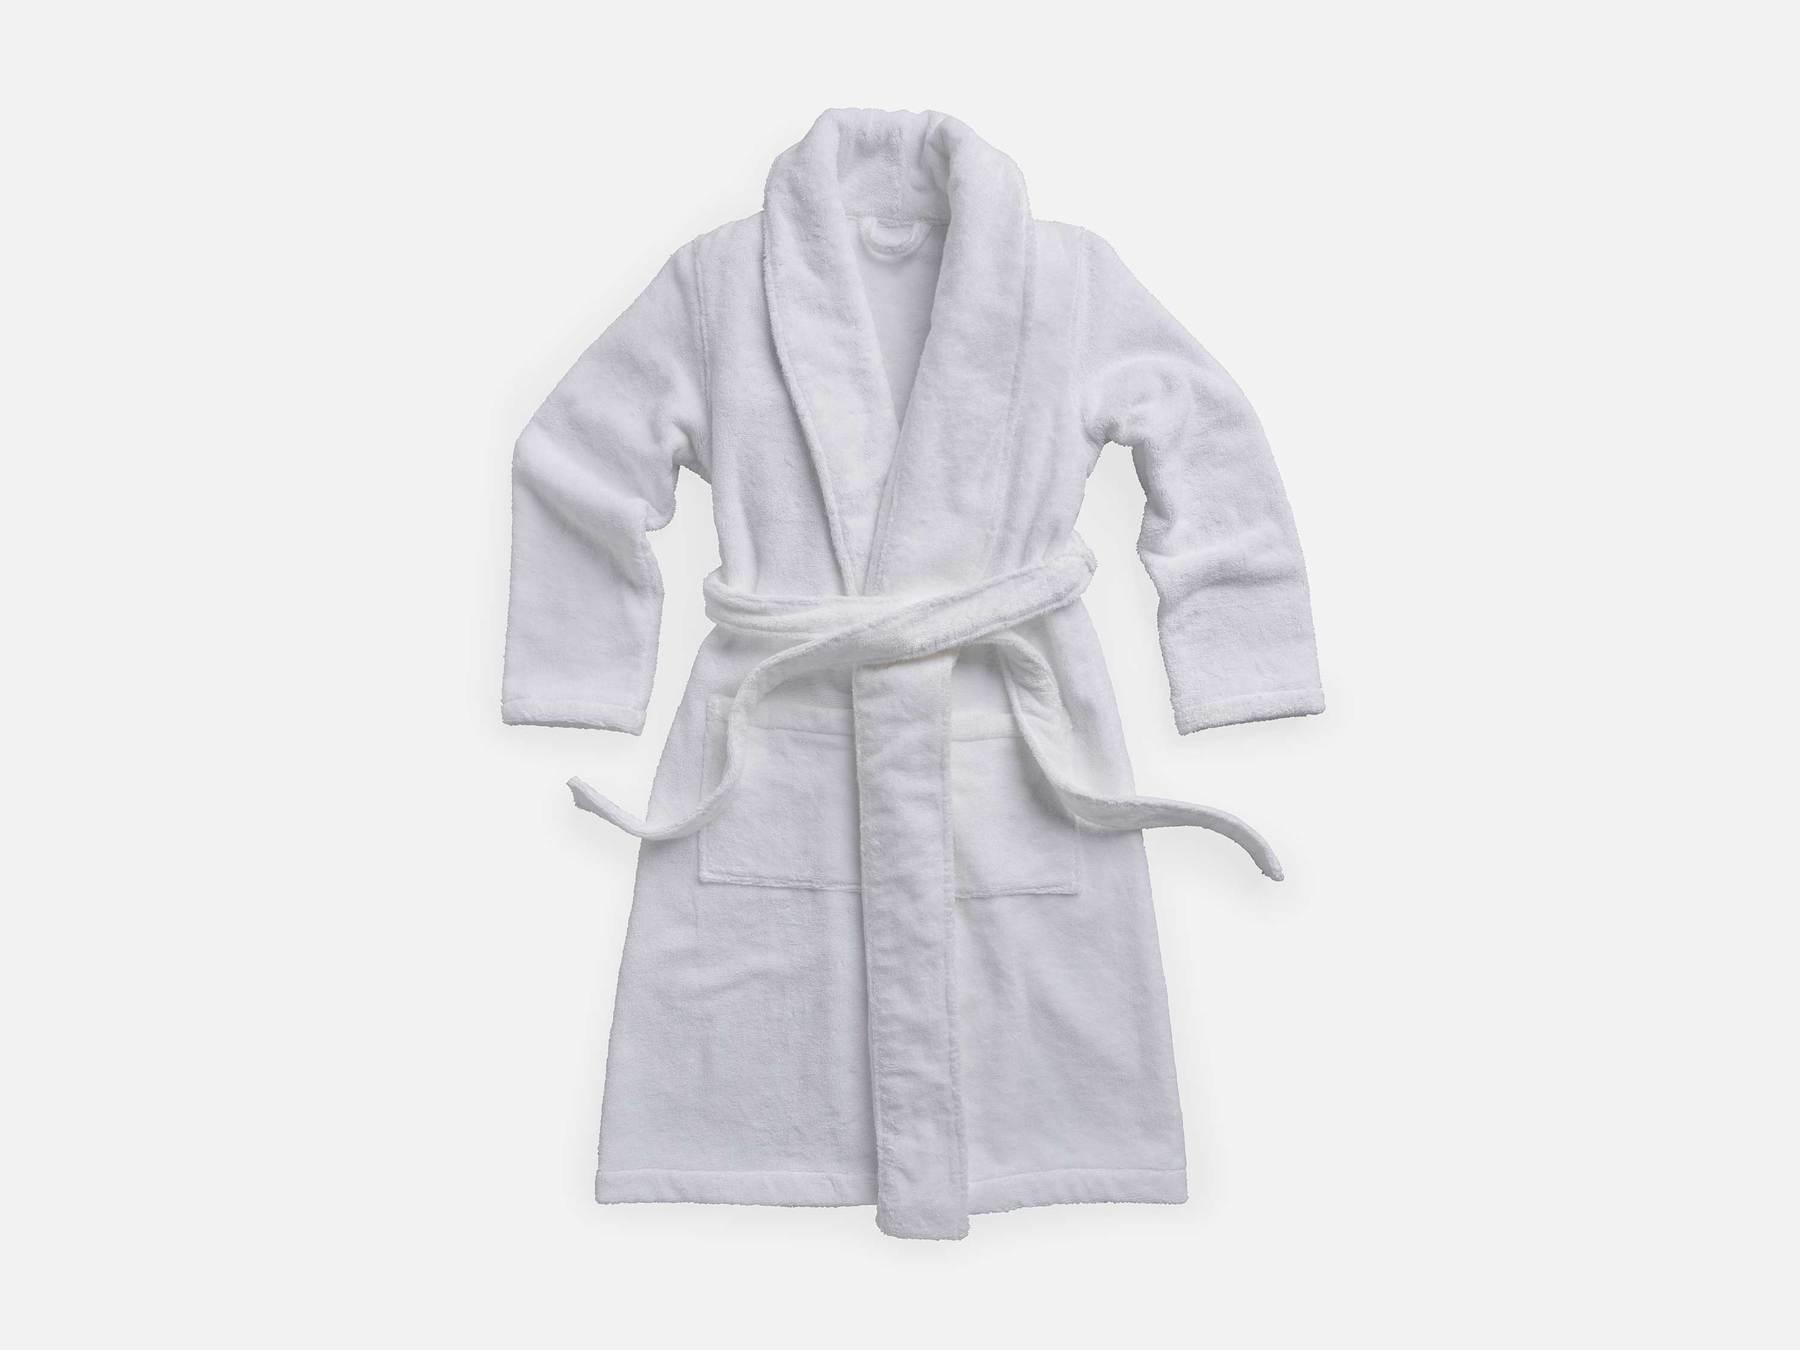 american-made-bathrobe_1800x1800